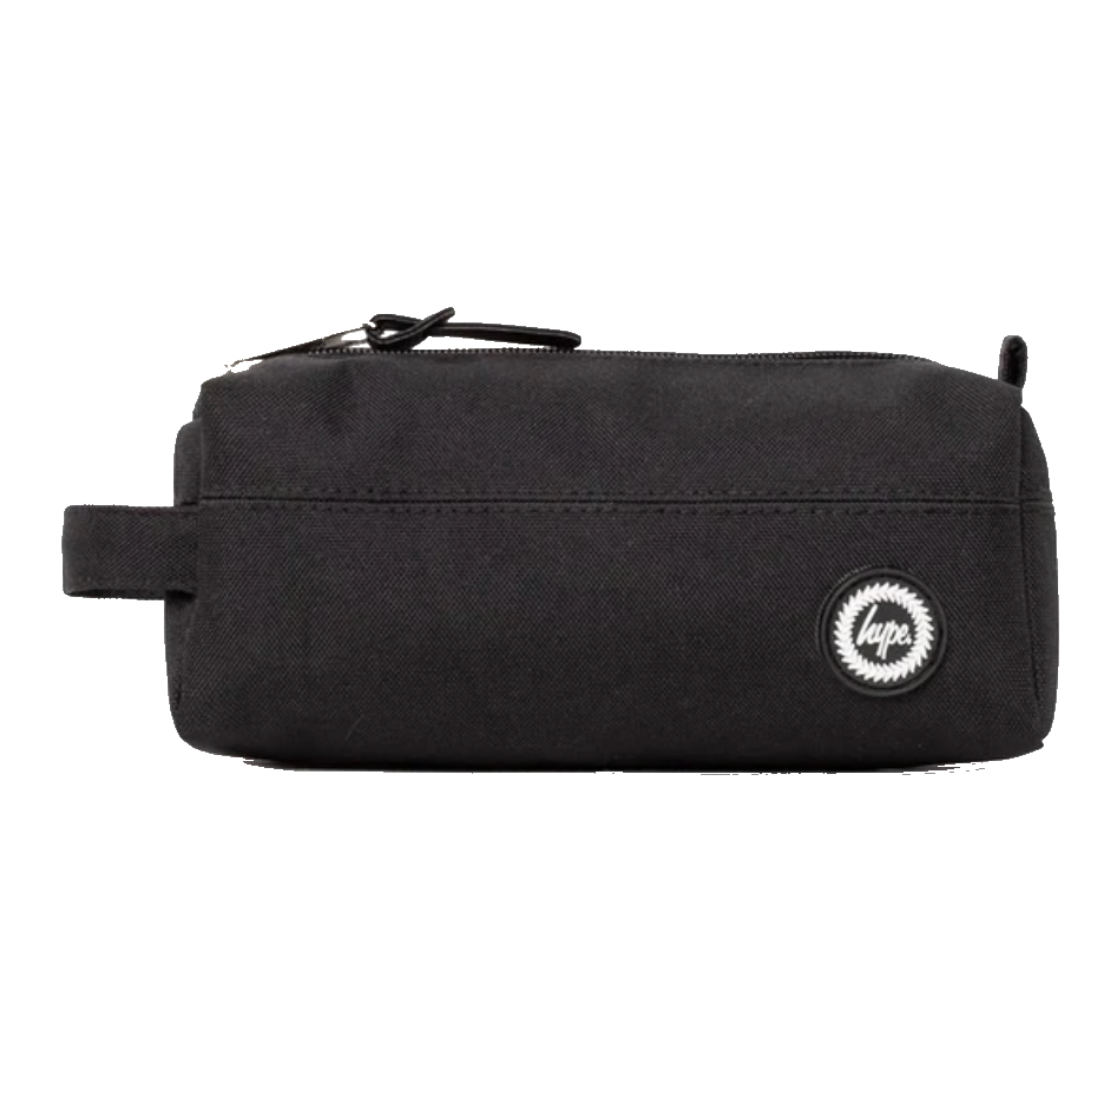 Hype - Black Crest Pencilcase